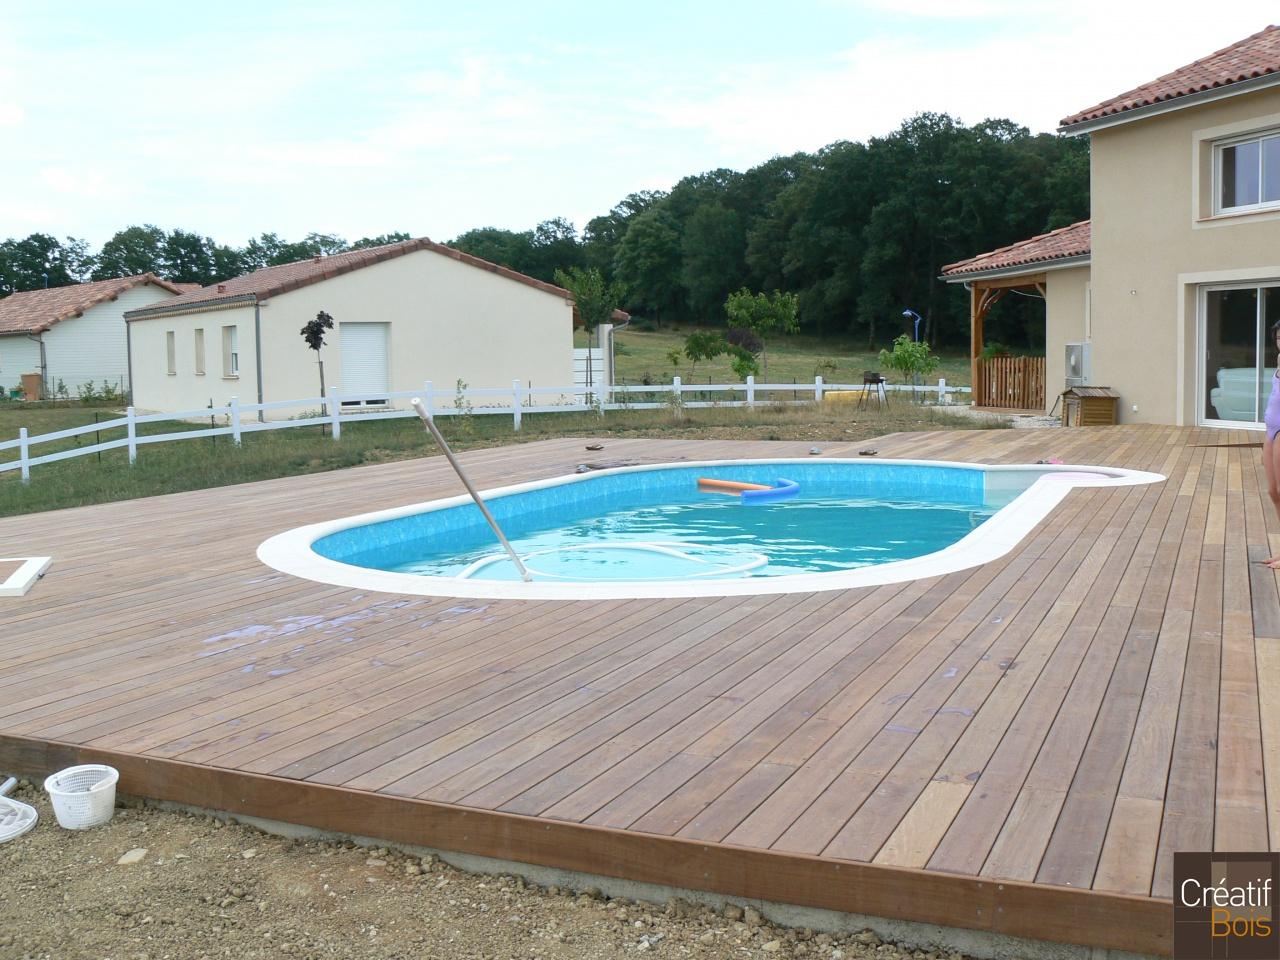 Piscine Bois Avec Terrasse plage de piscine alvignac - lot 46